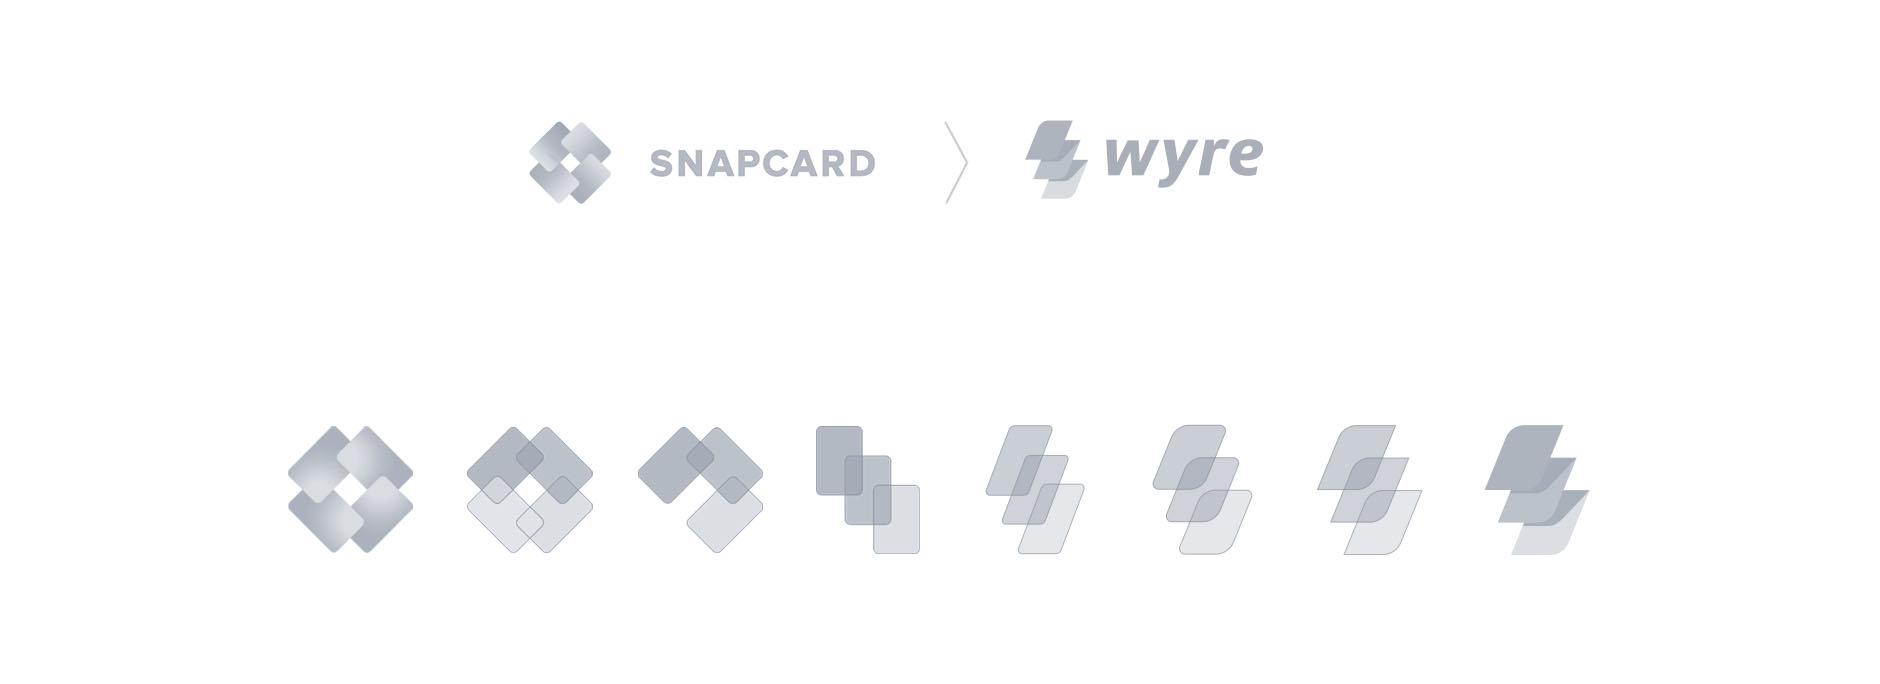 Snapcard brand legacy